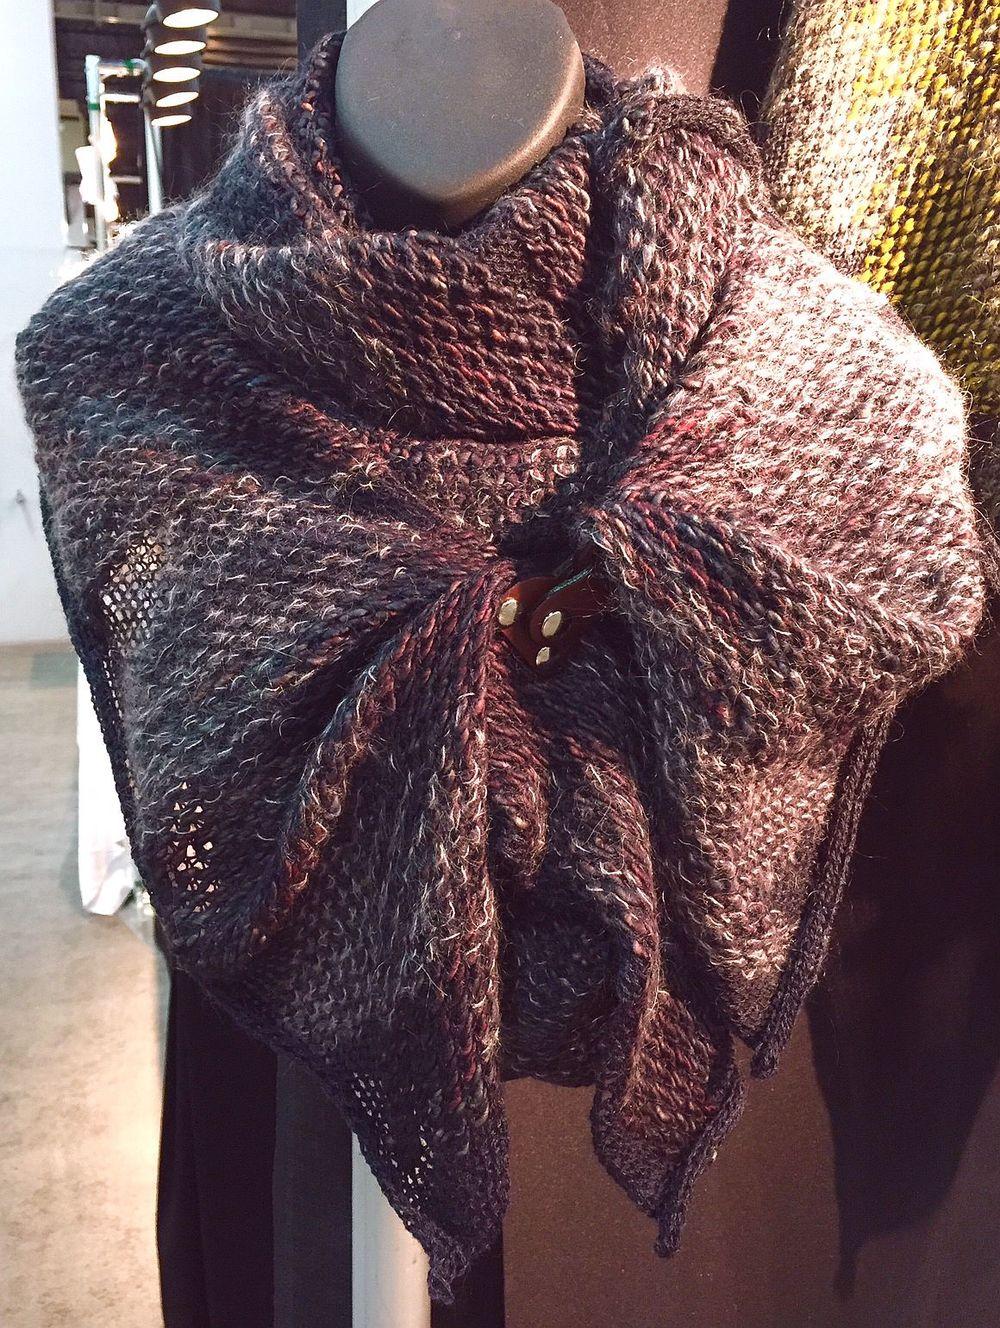 PicionAlpacaScarf.jpg